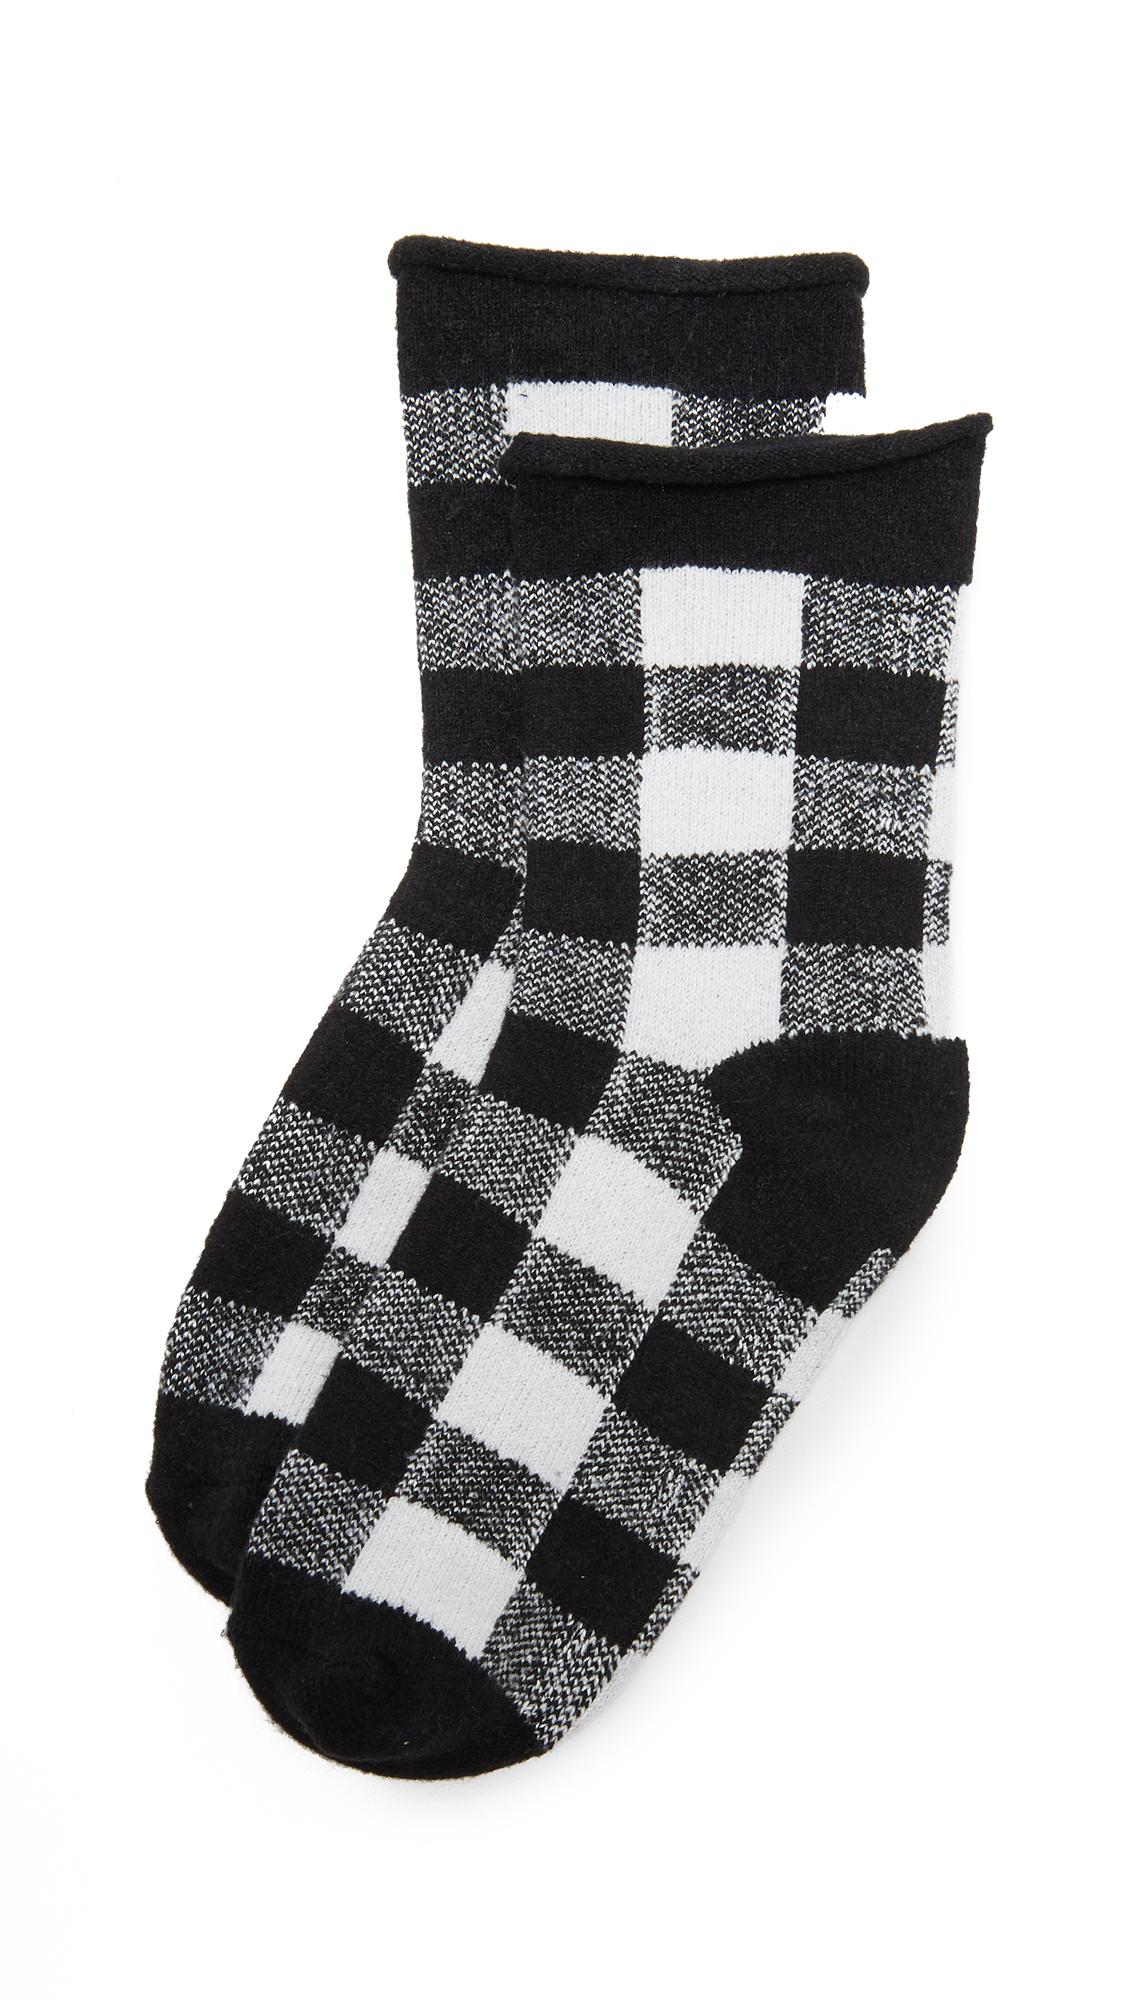 PLUSH Rolled Fleece Plaid Socks in Black/White Plaid